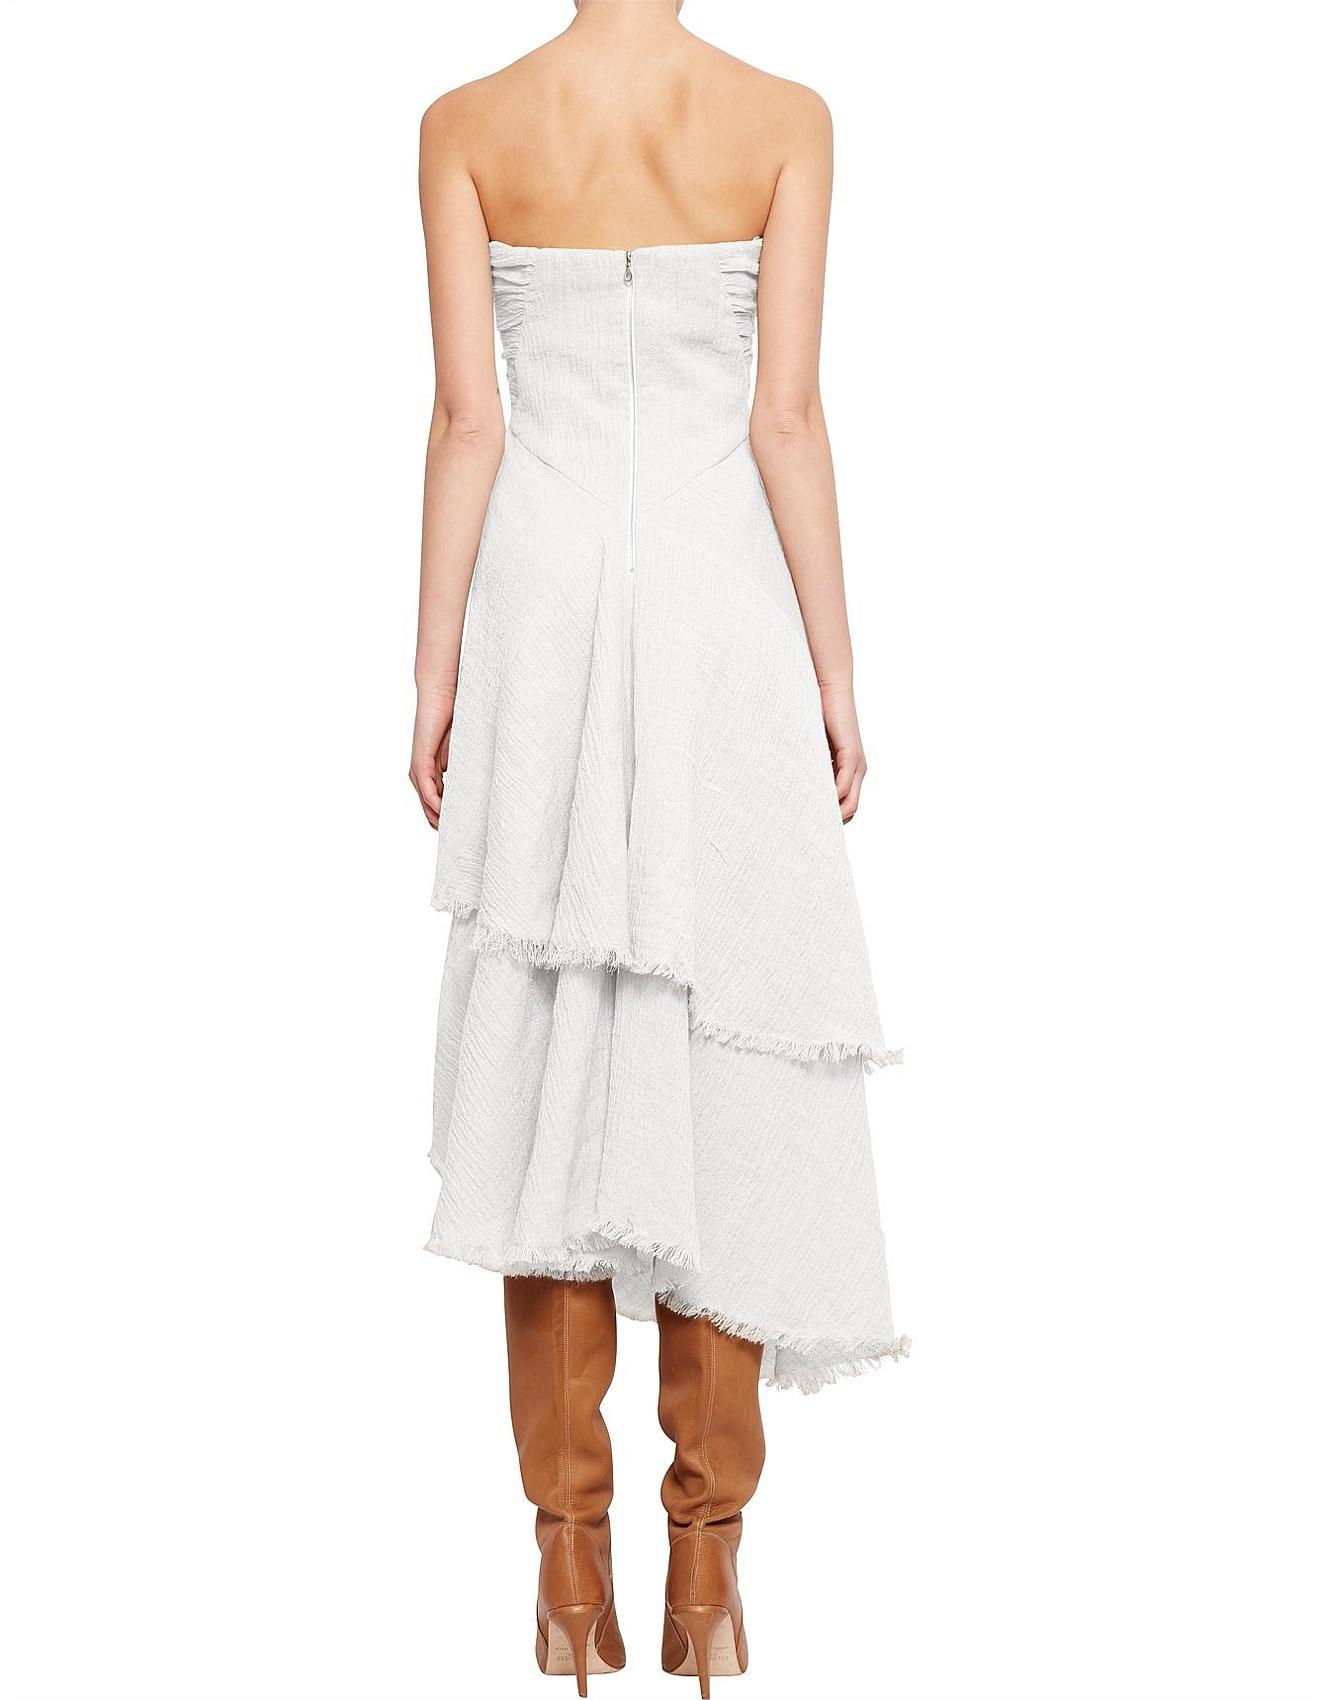 David Jones - Sea Change Strapless Dress